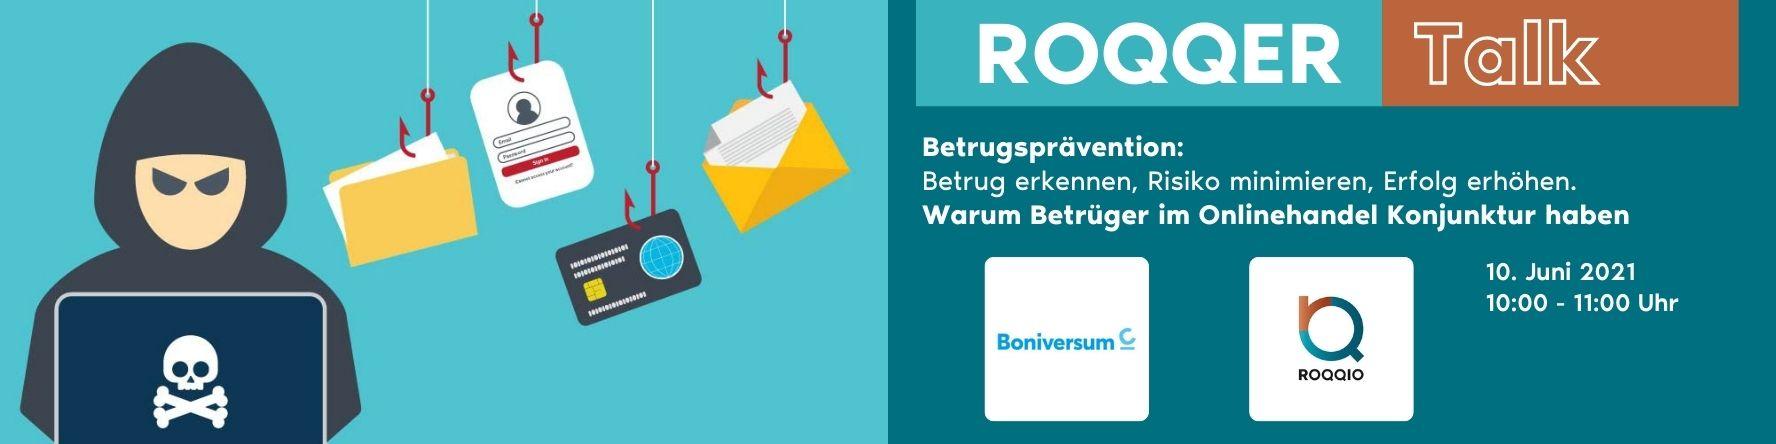 roqqer-talk-betrugspraevention-linkedin-event